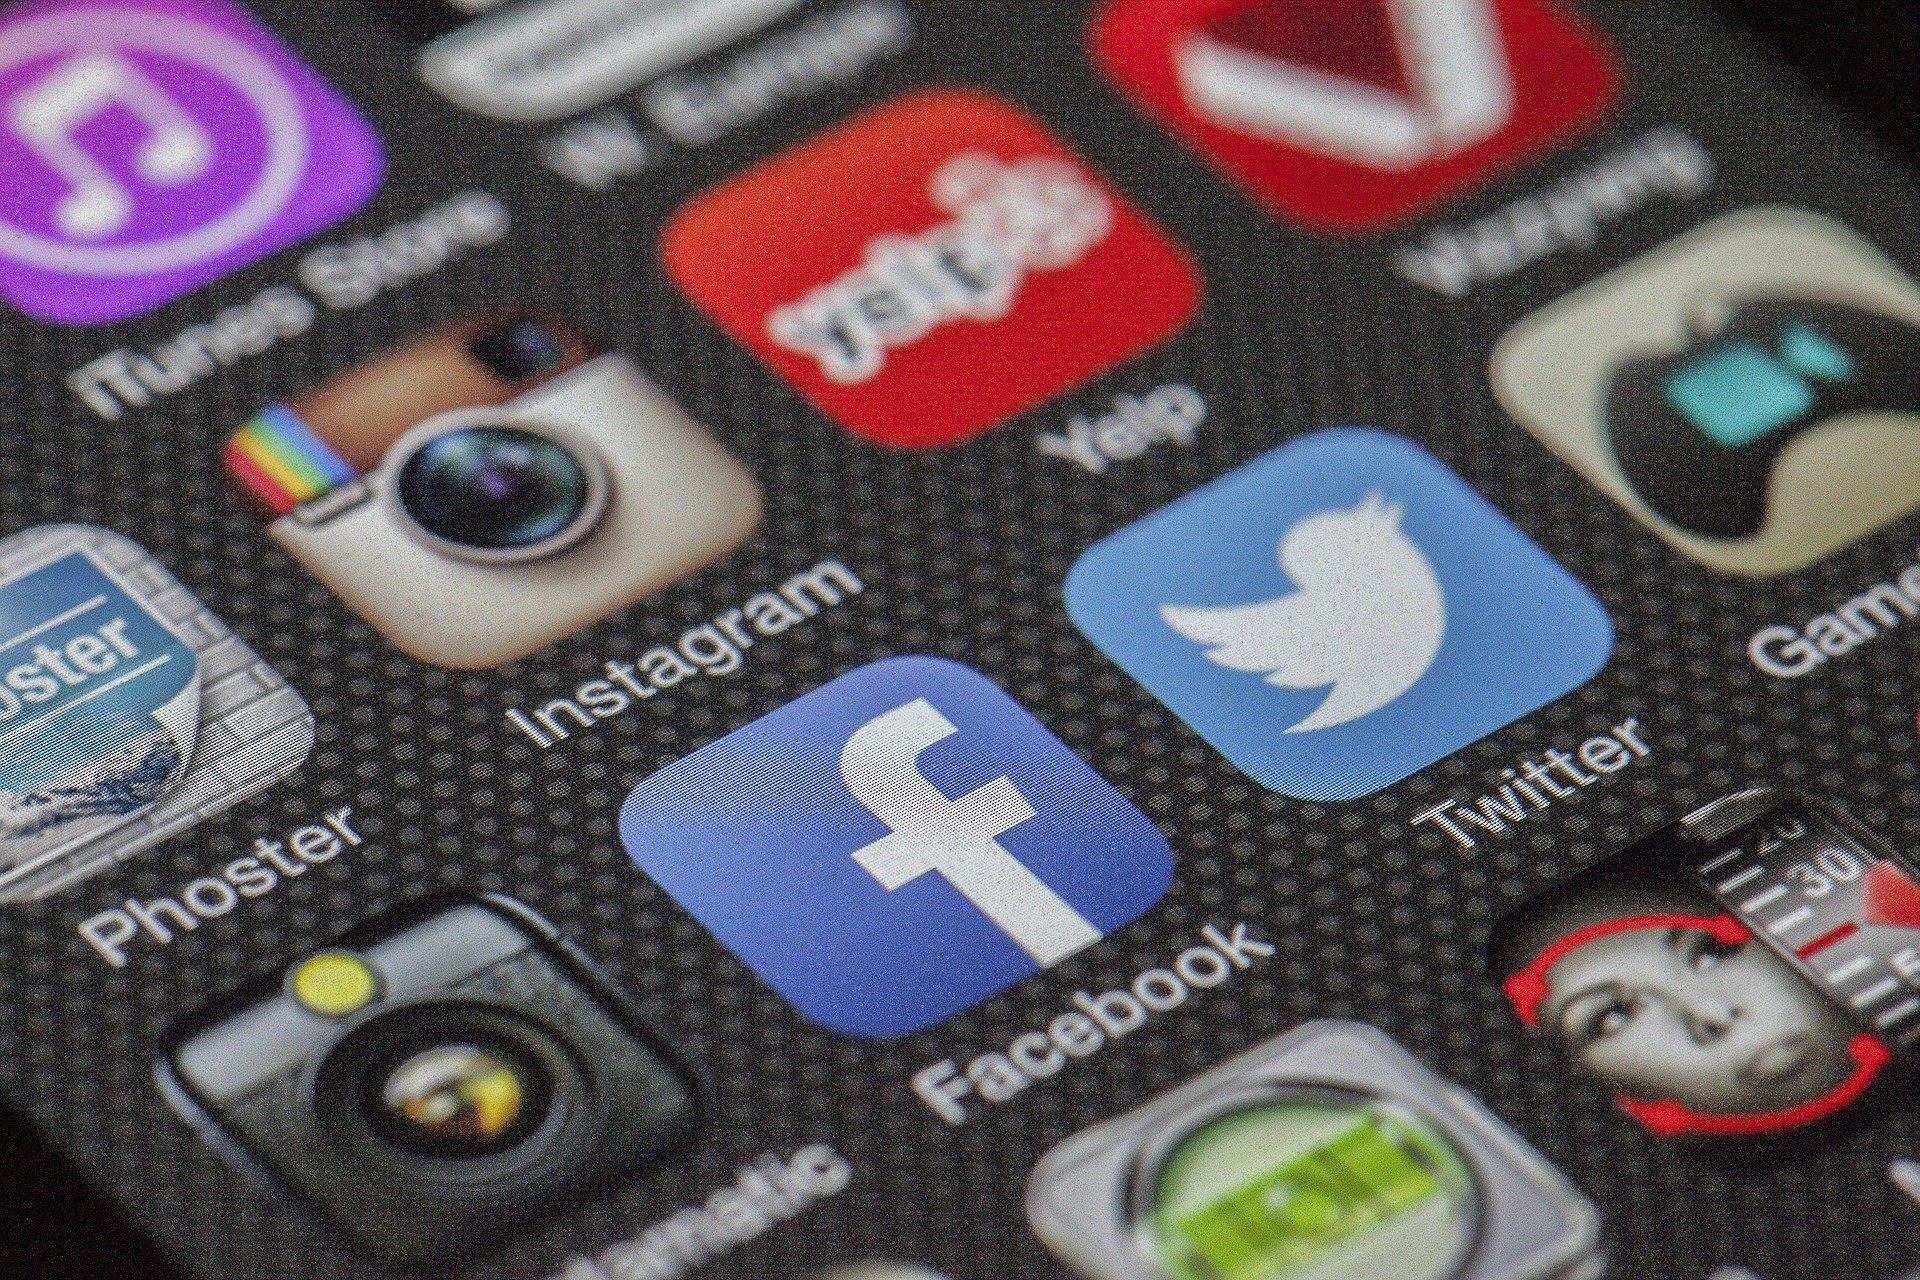 Facebook 或将推出实时直播购物功能,已收购一家视频购物初创公司 Packagd